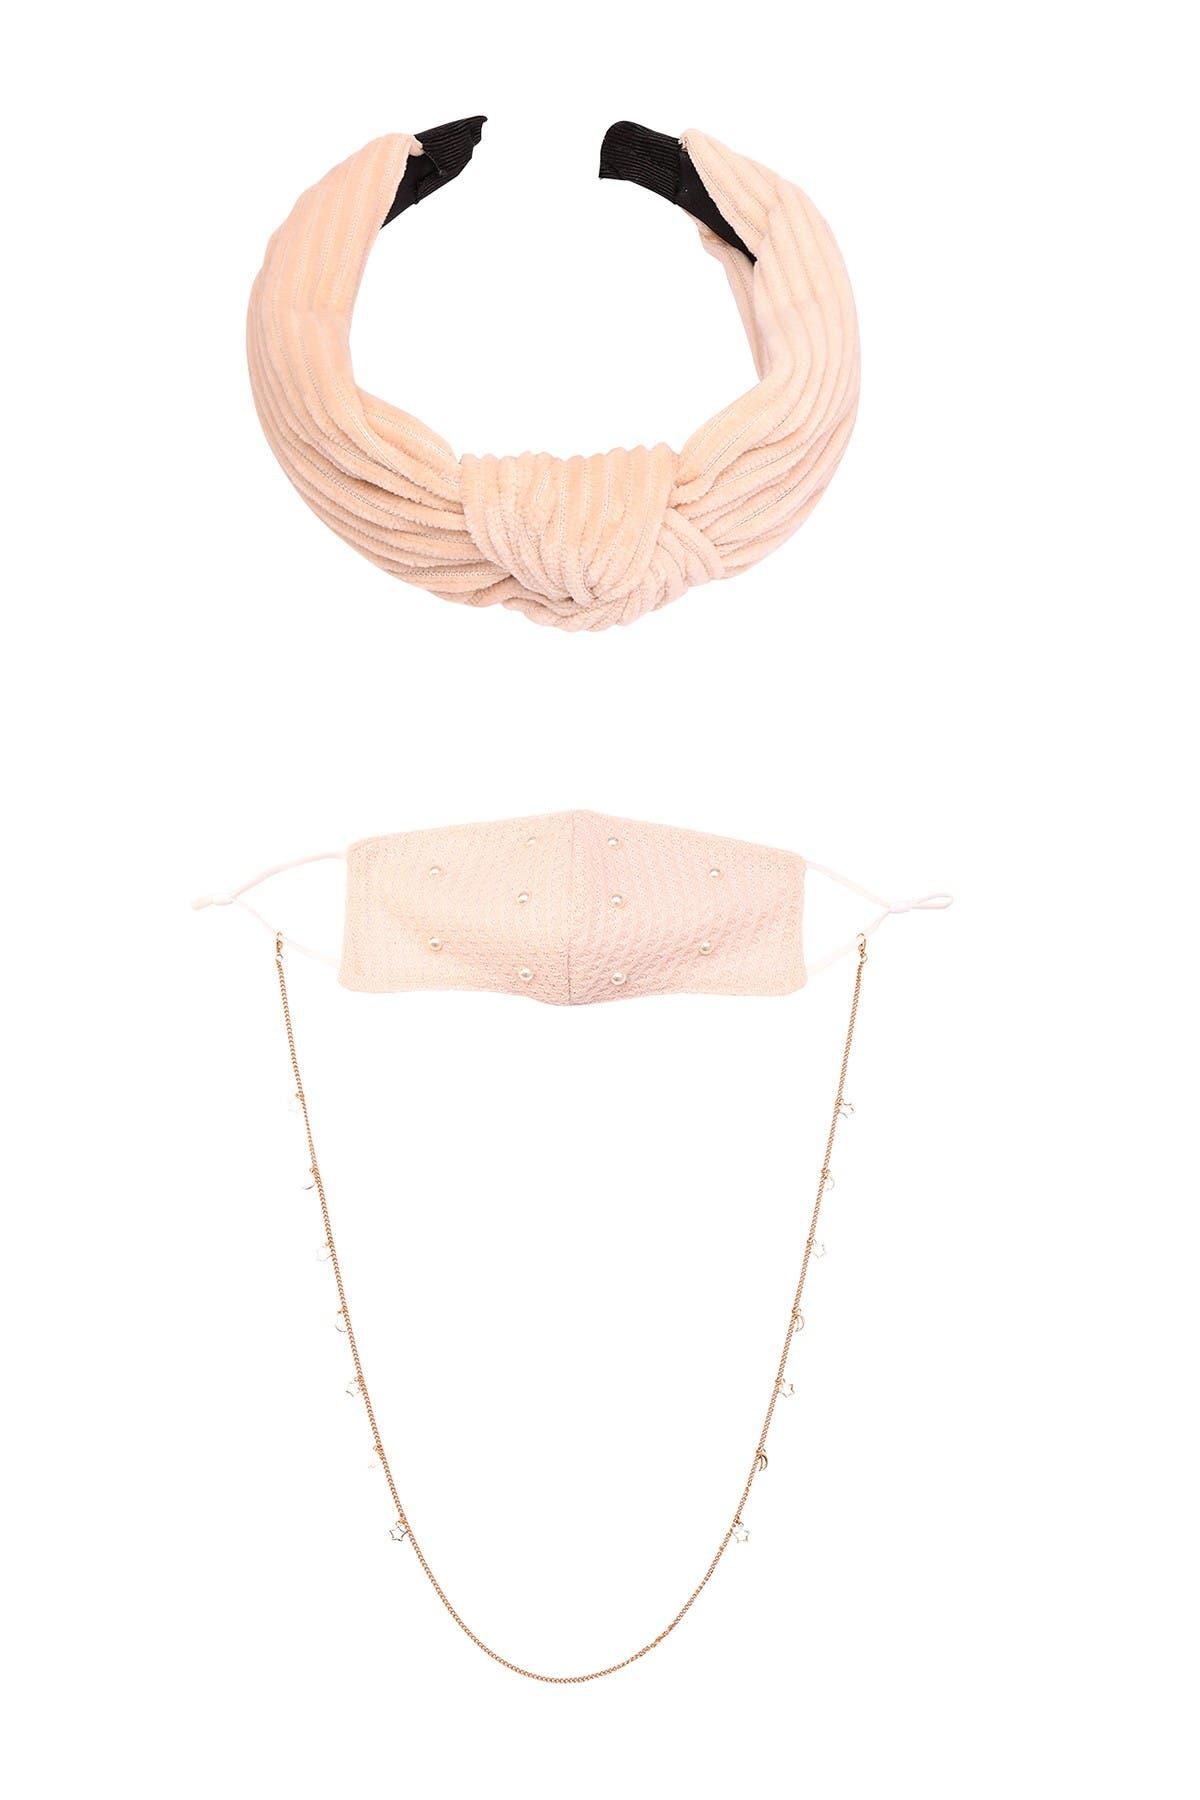 Image of Berry So Soft Face Mask, Chain & Headband Set - 3 Piece Set